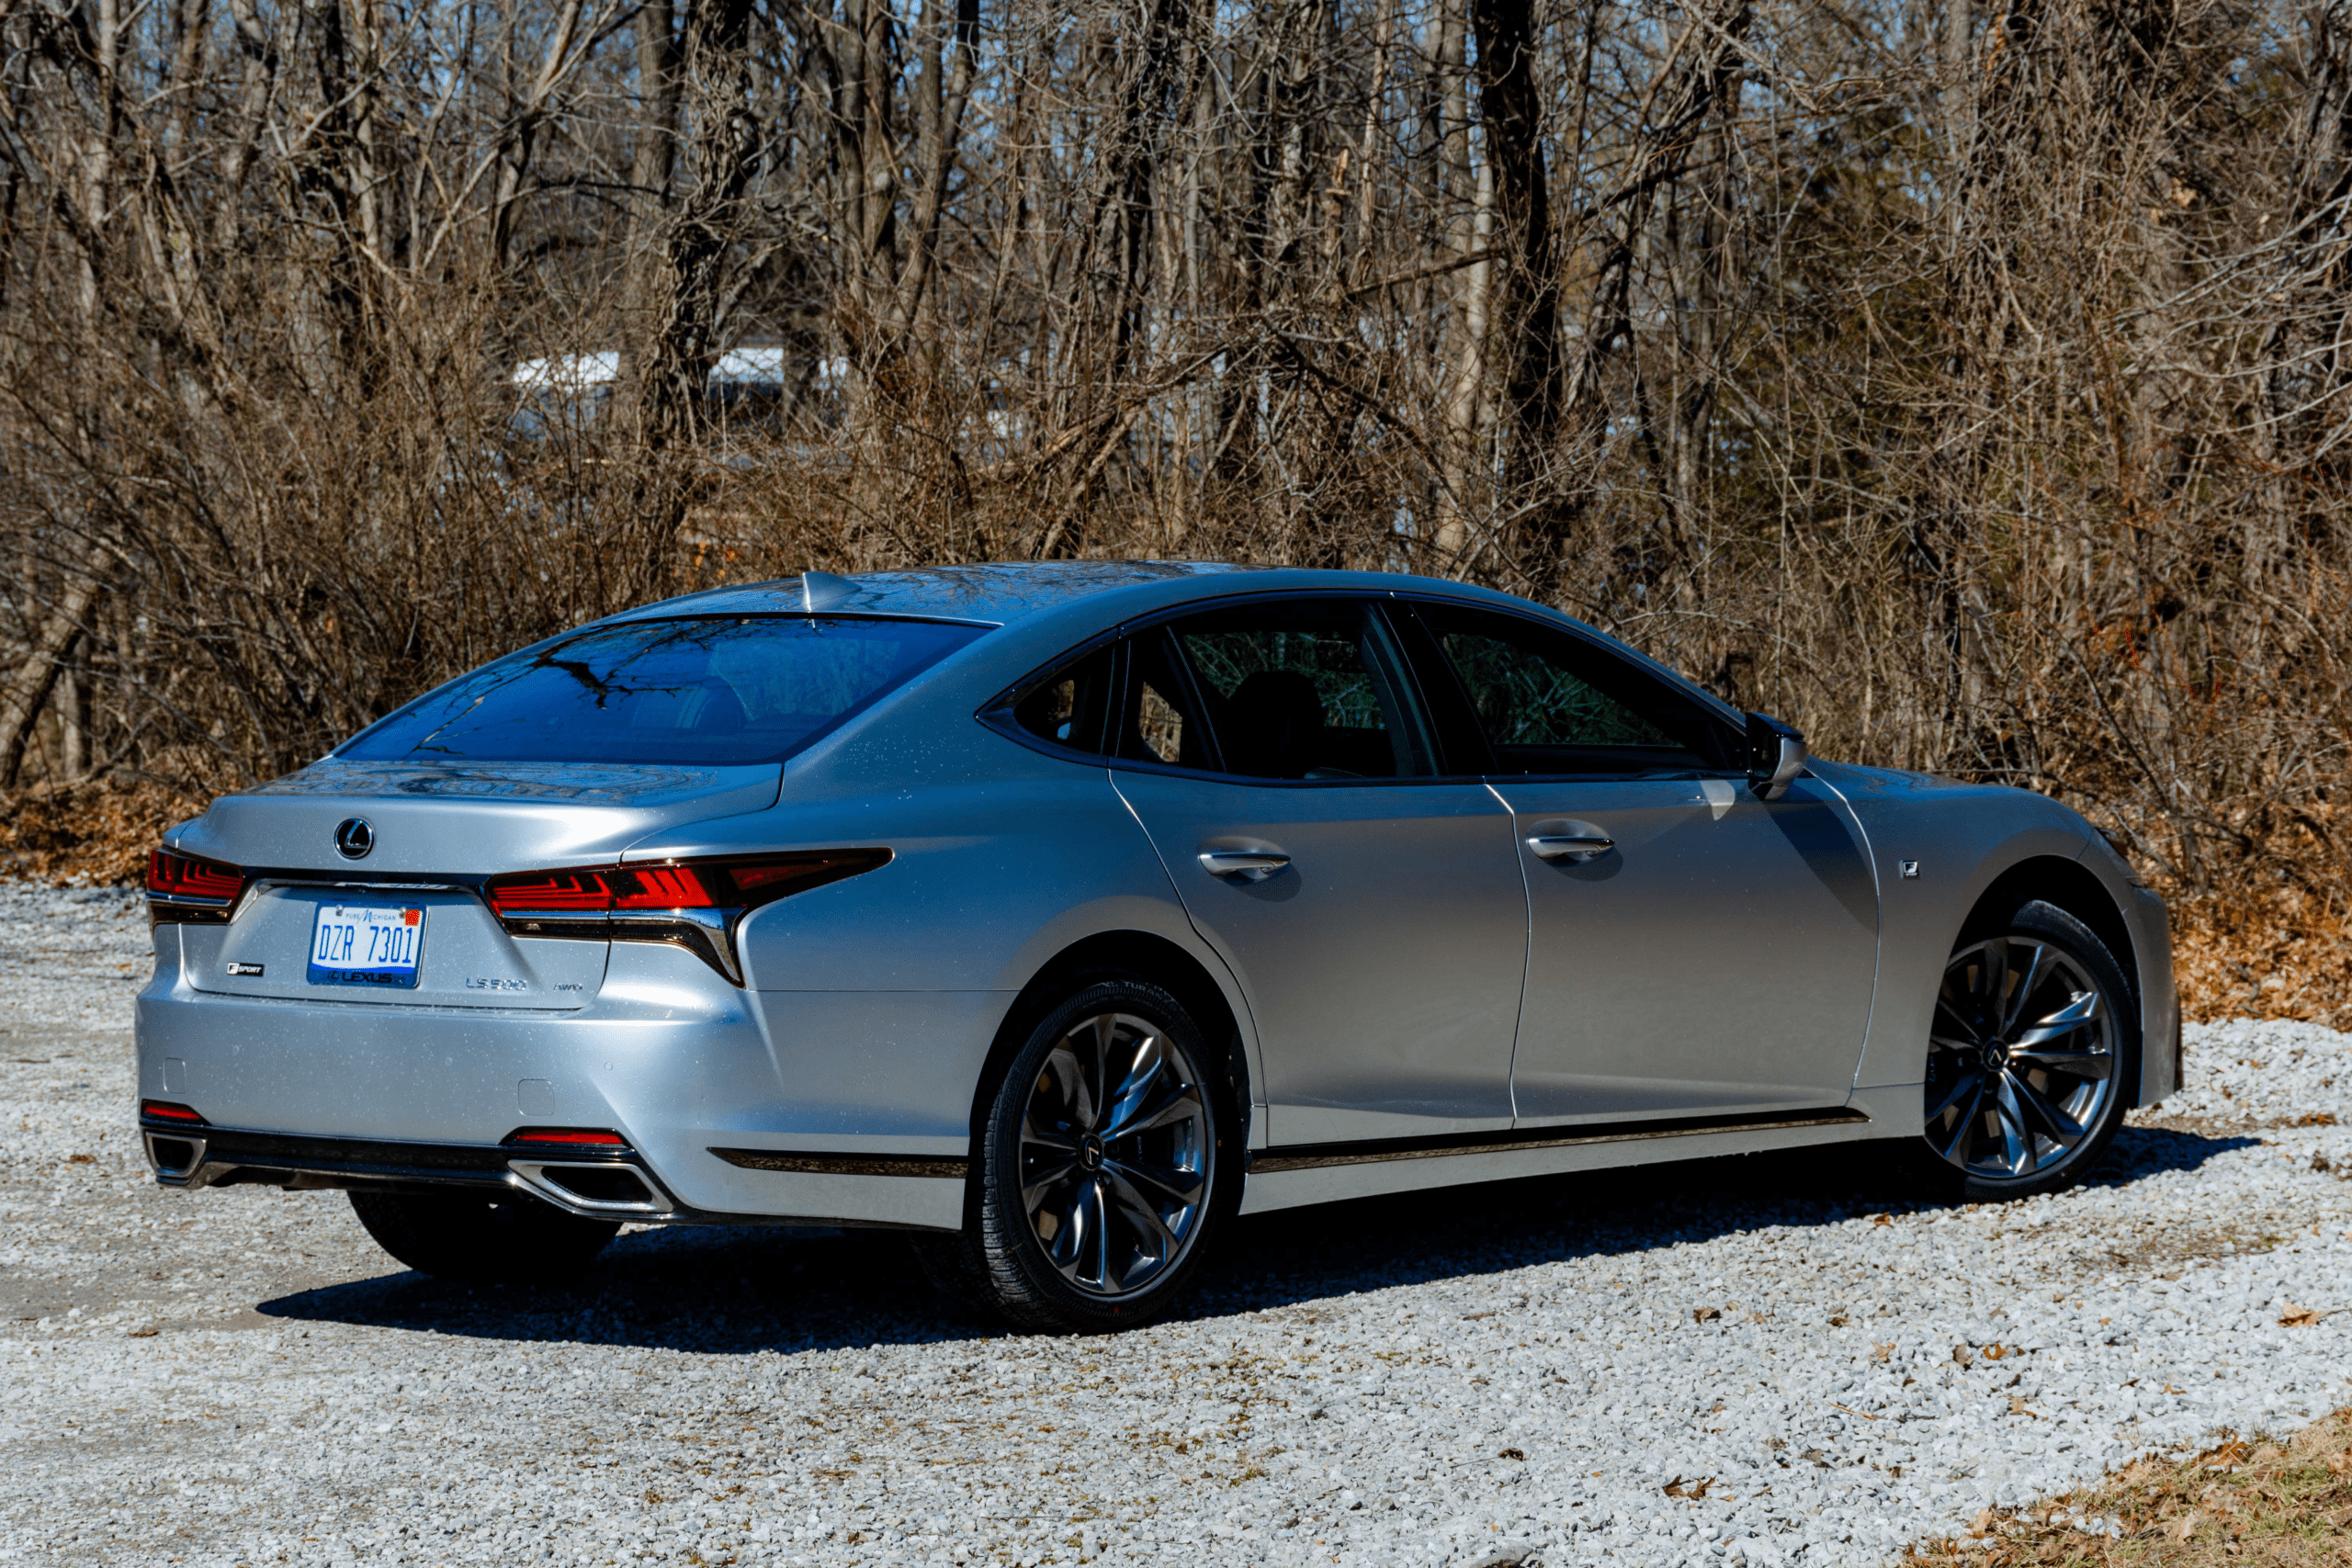 2021 Lexus Ls 460 Reviews